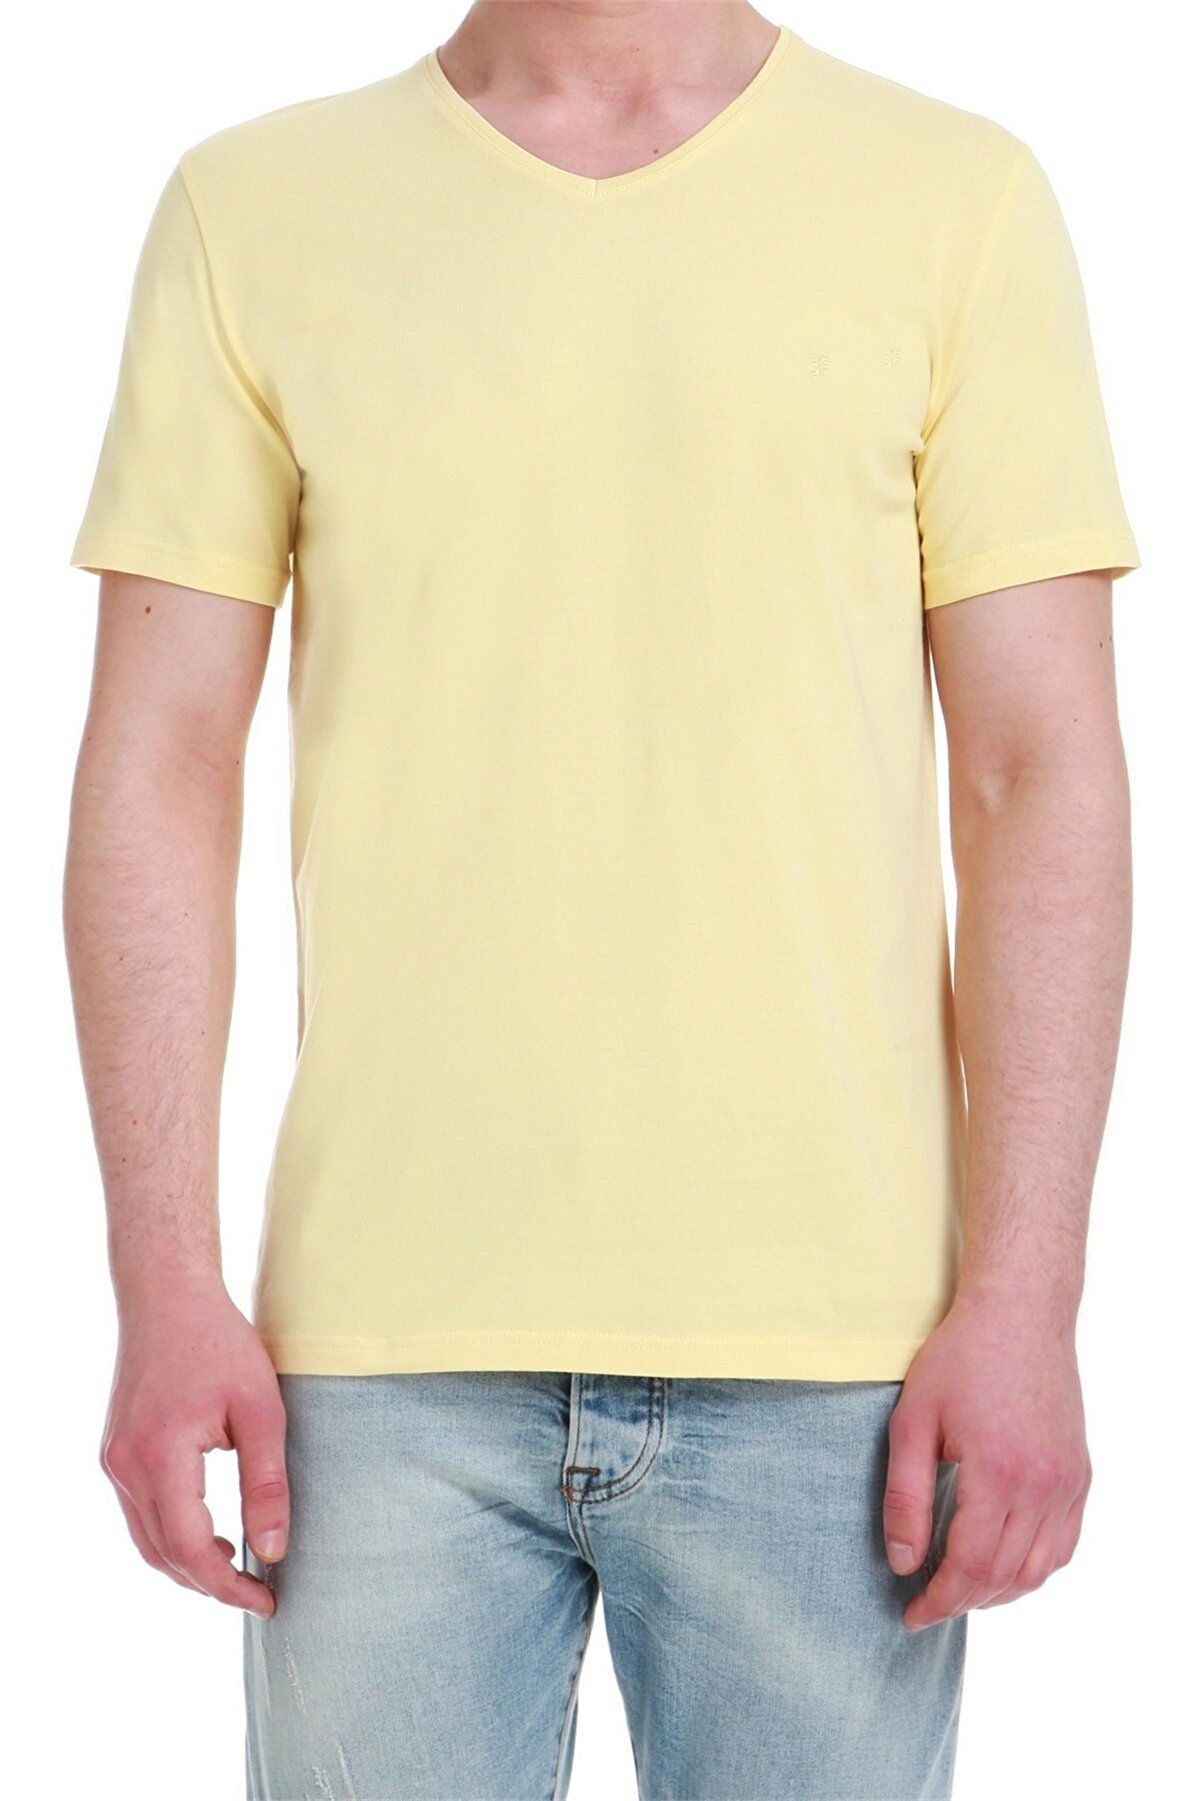 Efor Ts 740 Slim Fit Sarı Spor T-shirt